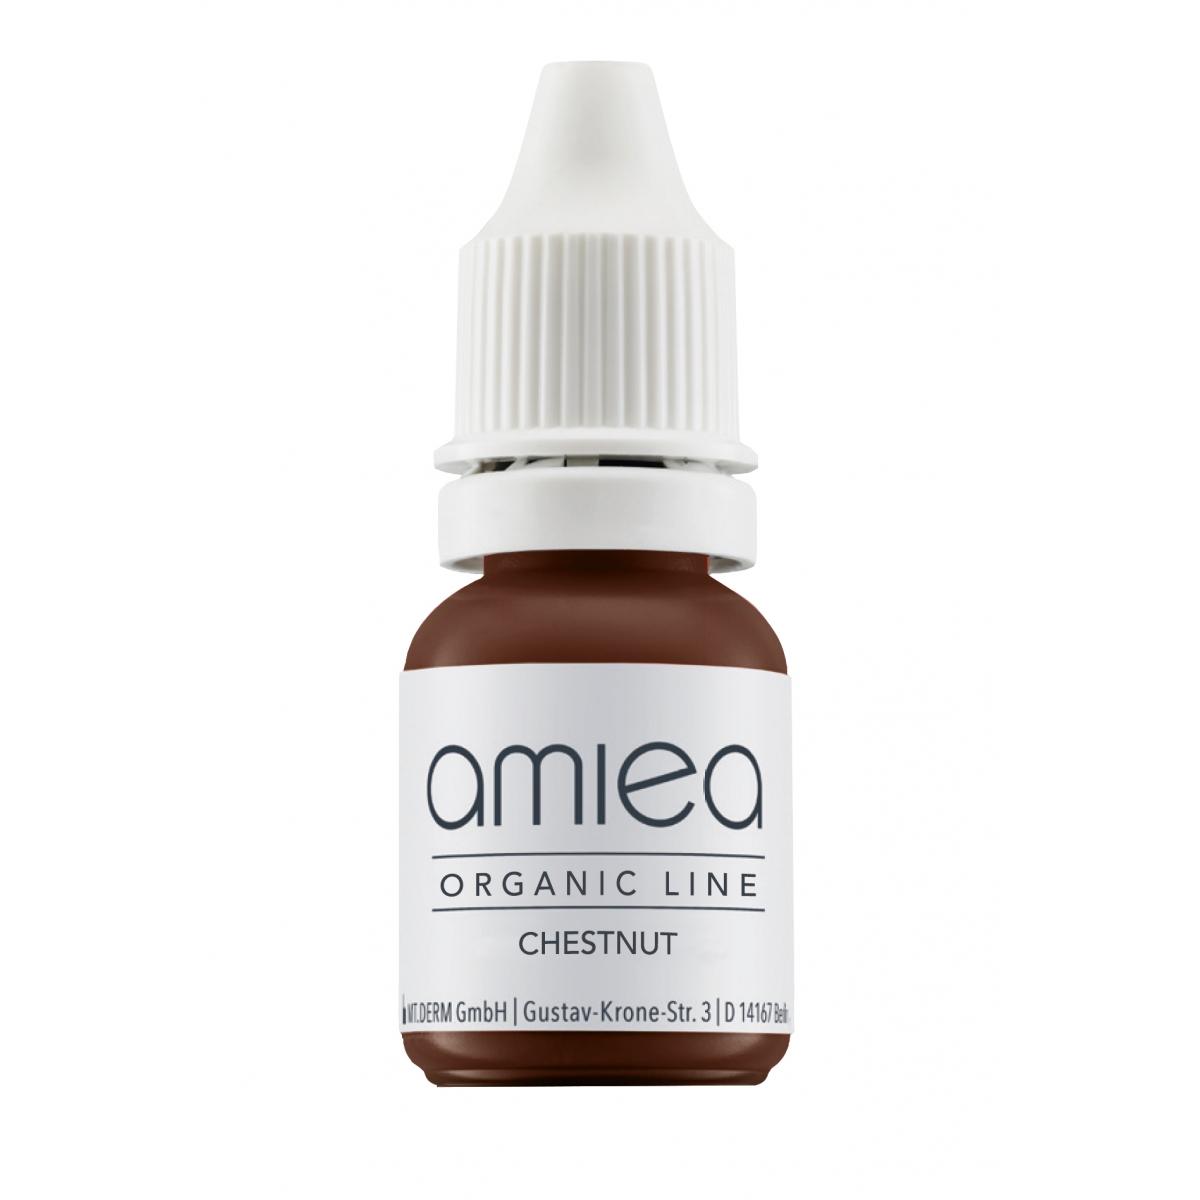 ORGANIC LINE (10ml) - PIGMENT CHESTNUT ORGANICLINE AMIEA (10 ml)